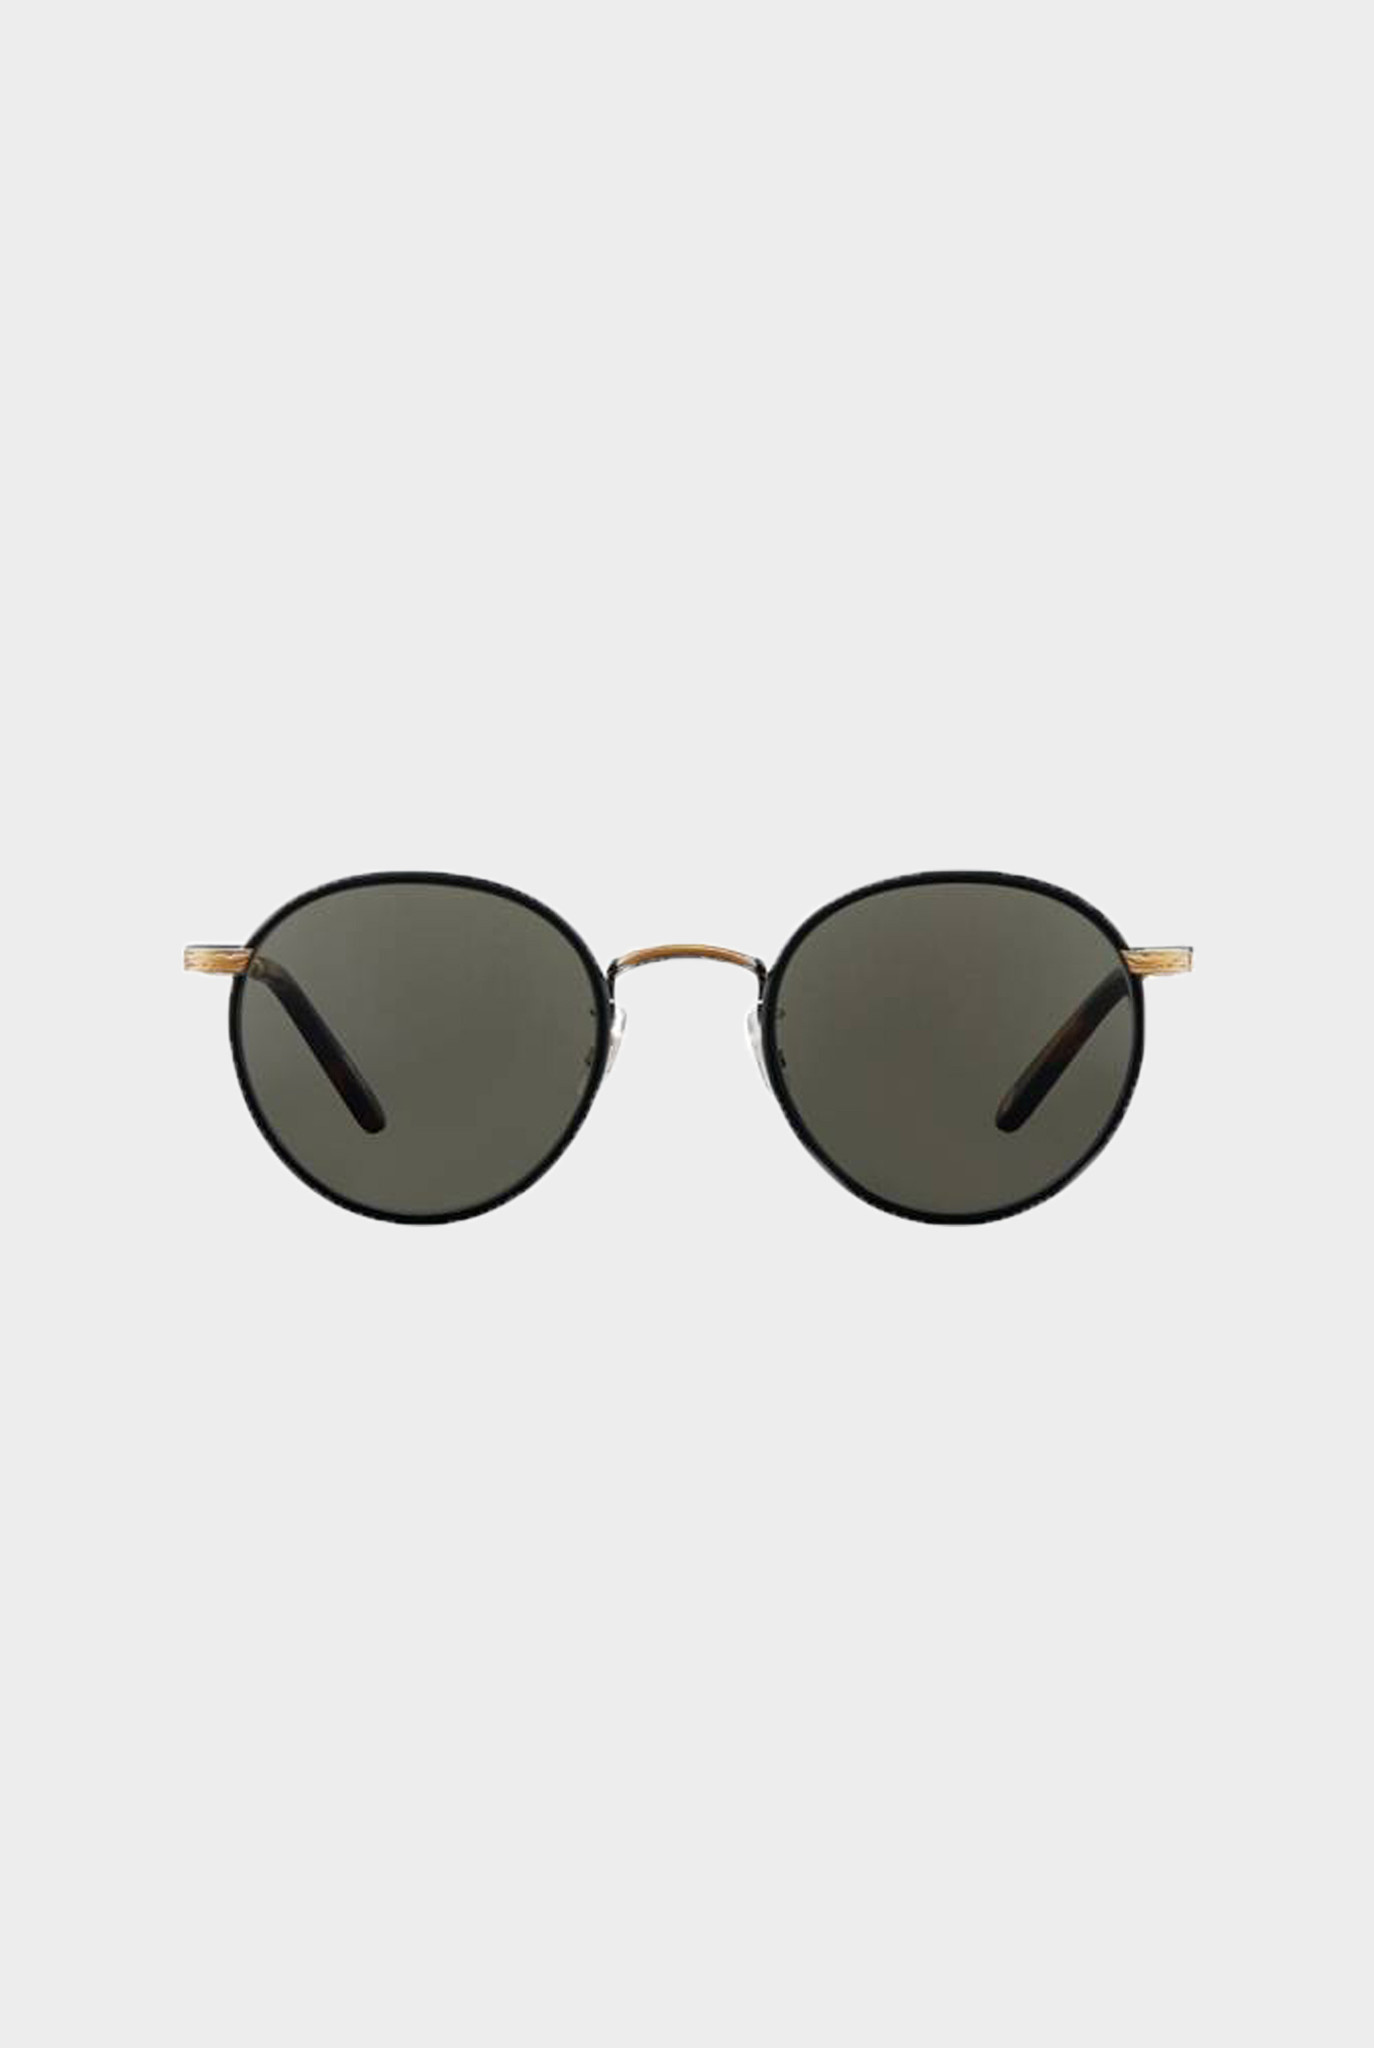 Wilson sunglasses Matte Black-Matte Spotted Tortoise/Pure Grey